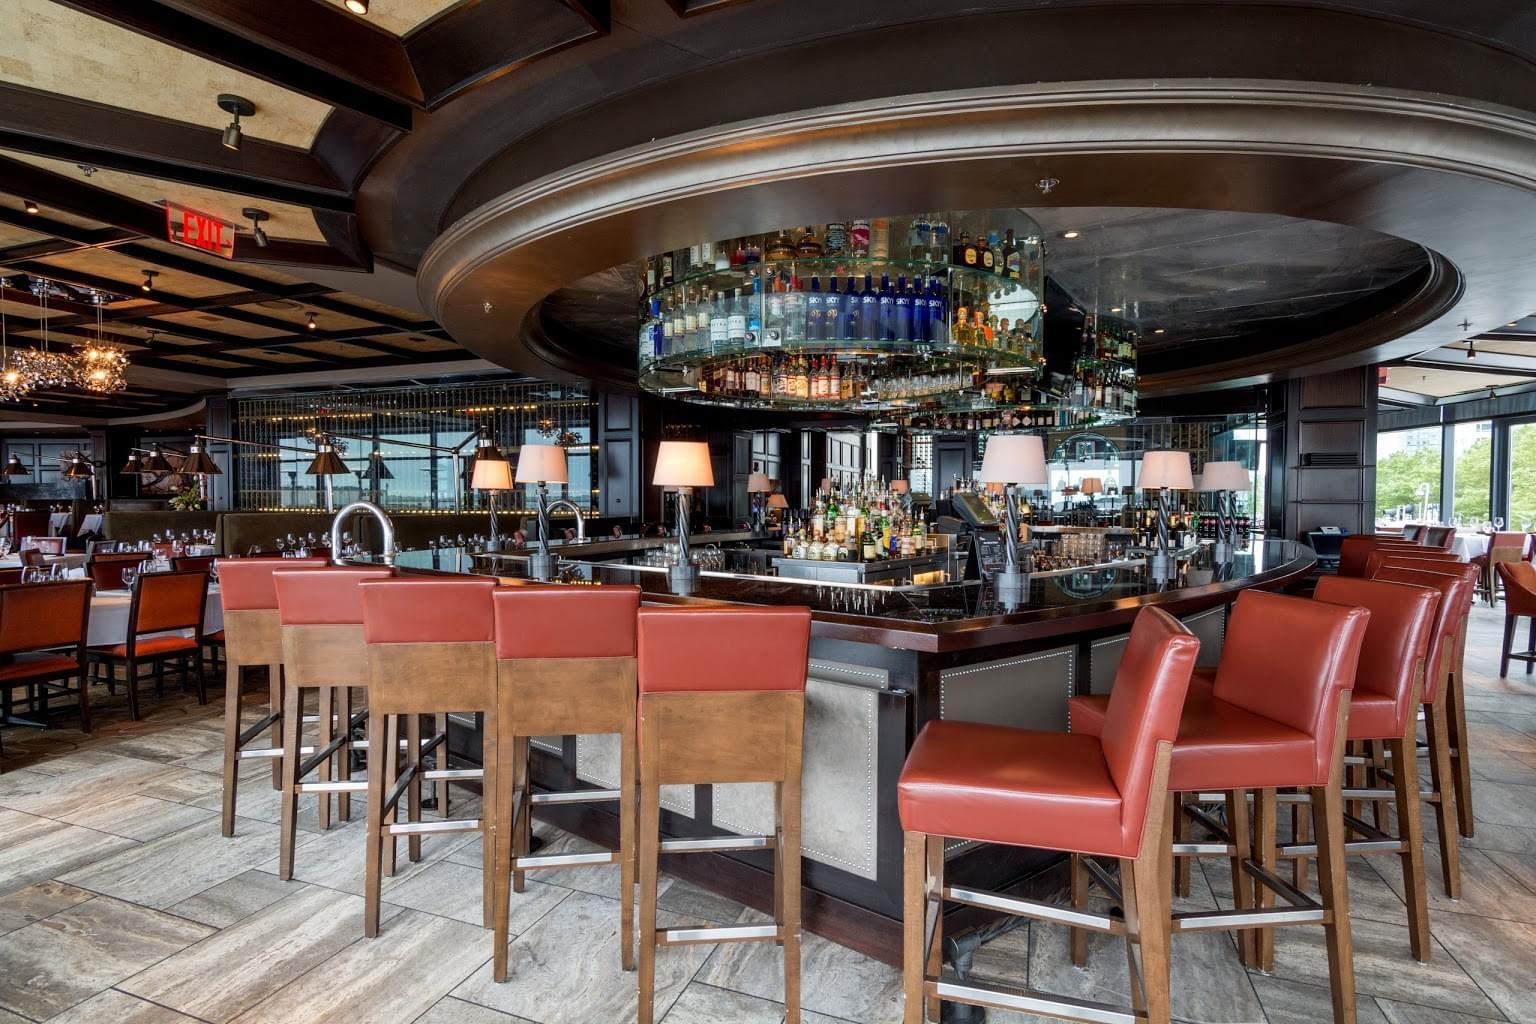 Del frisco 39 s double eagle steak house boston ma see for Ma cuisine